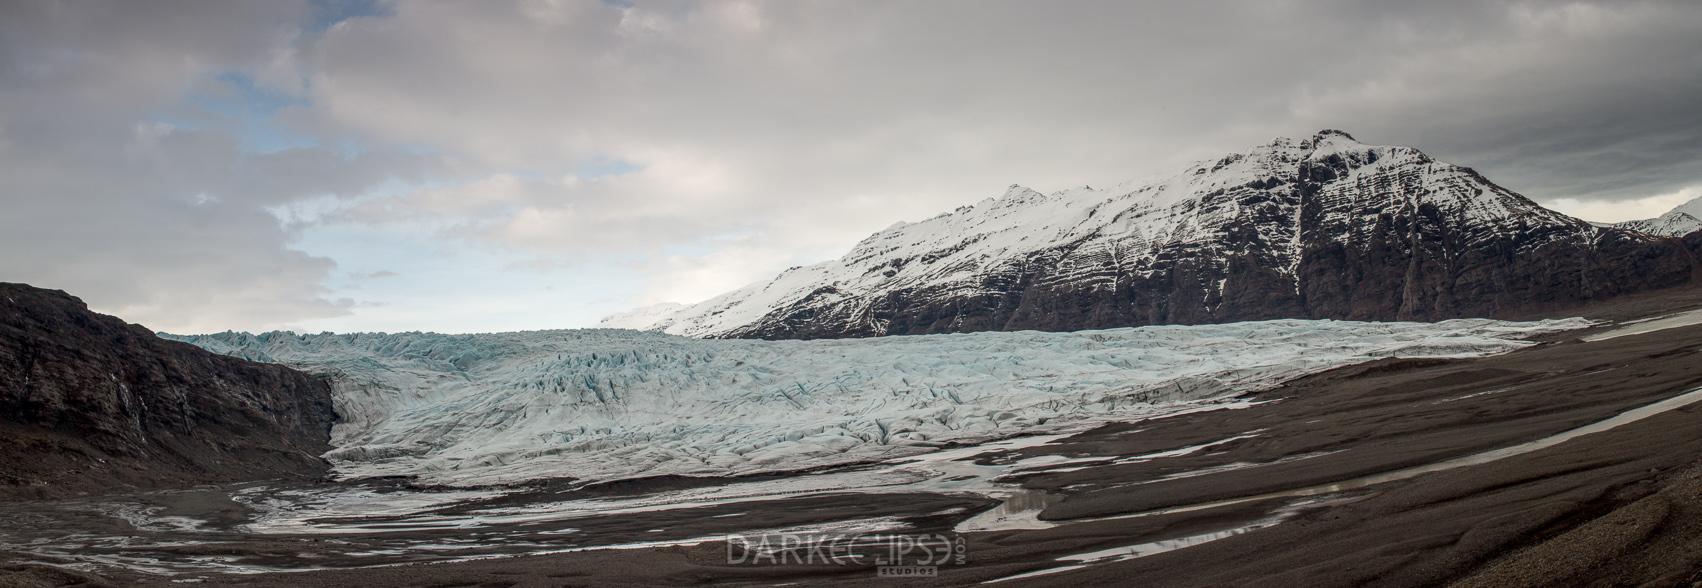 03032014 - Faajokull Glacier panorama-